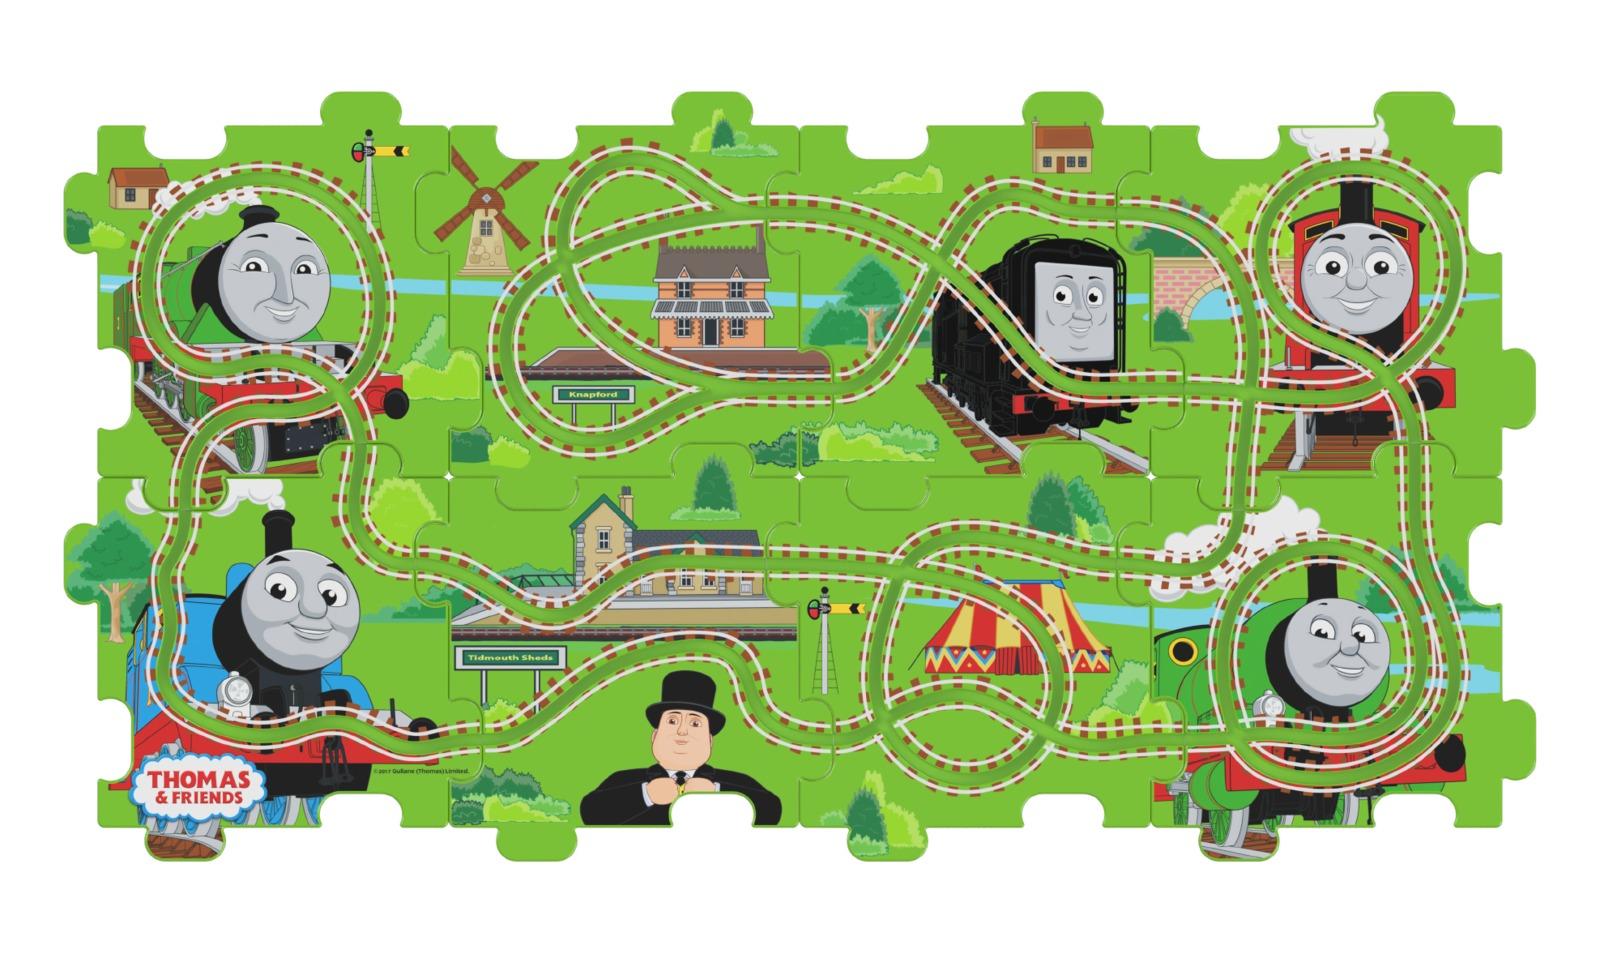 Thomas & Friends: Track & Tile - Playset image